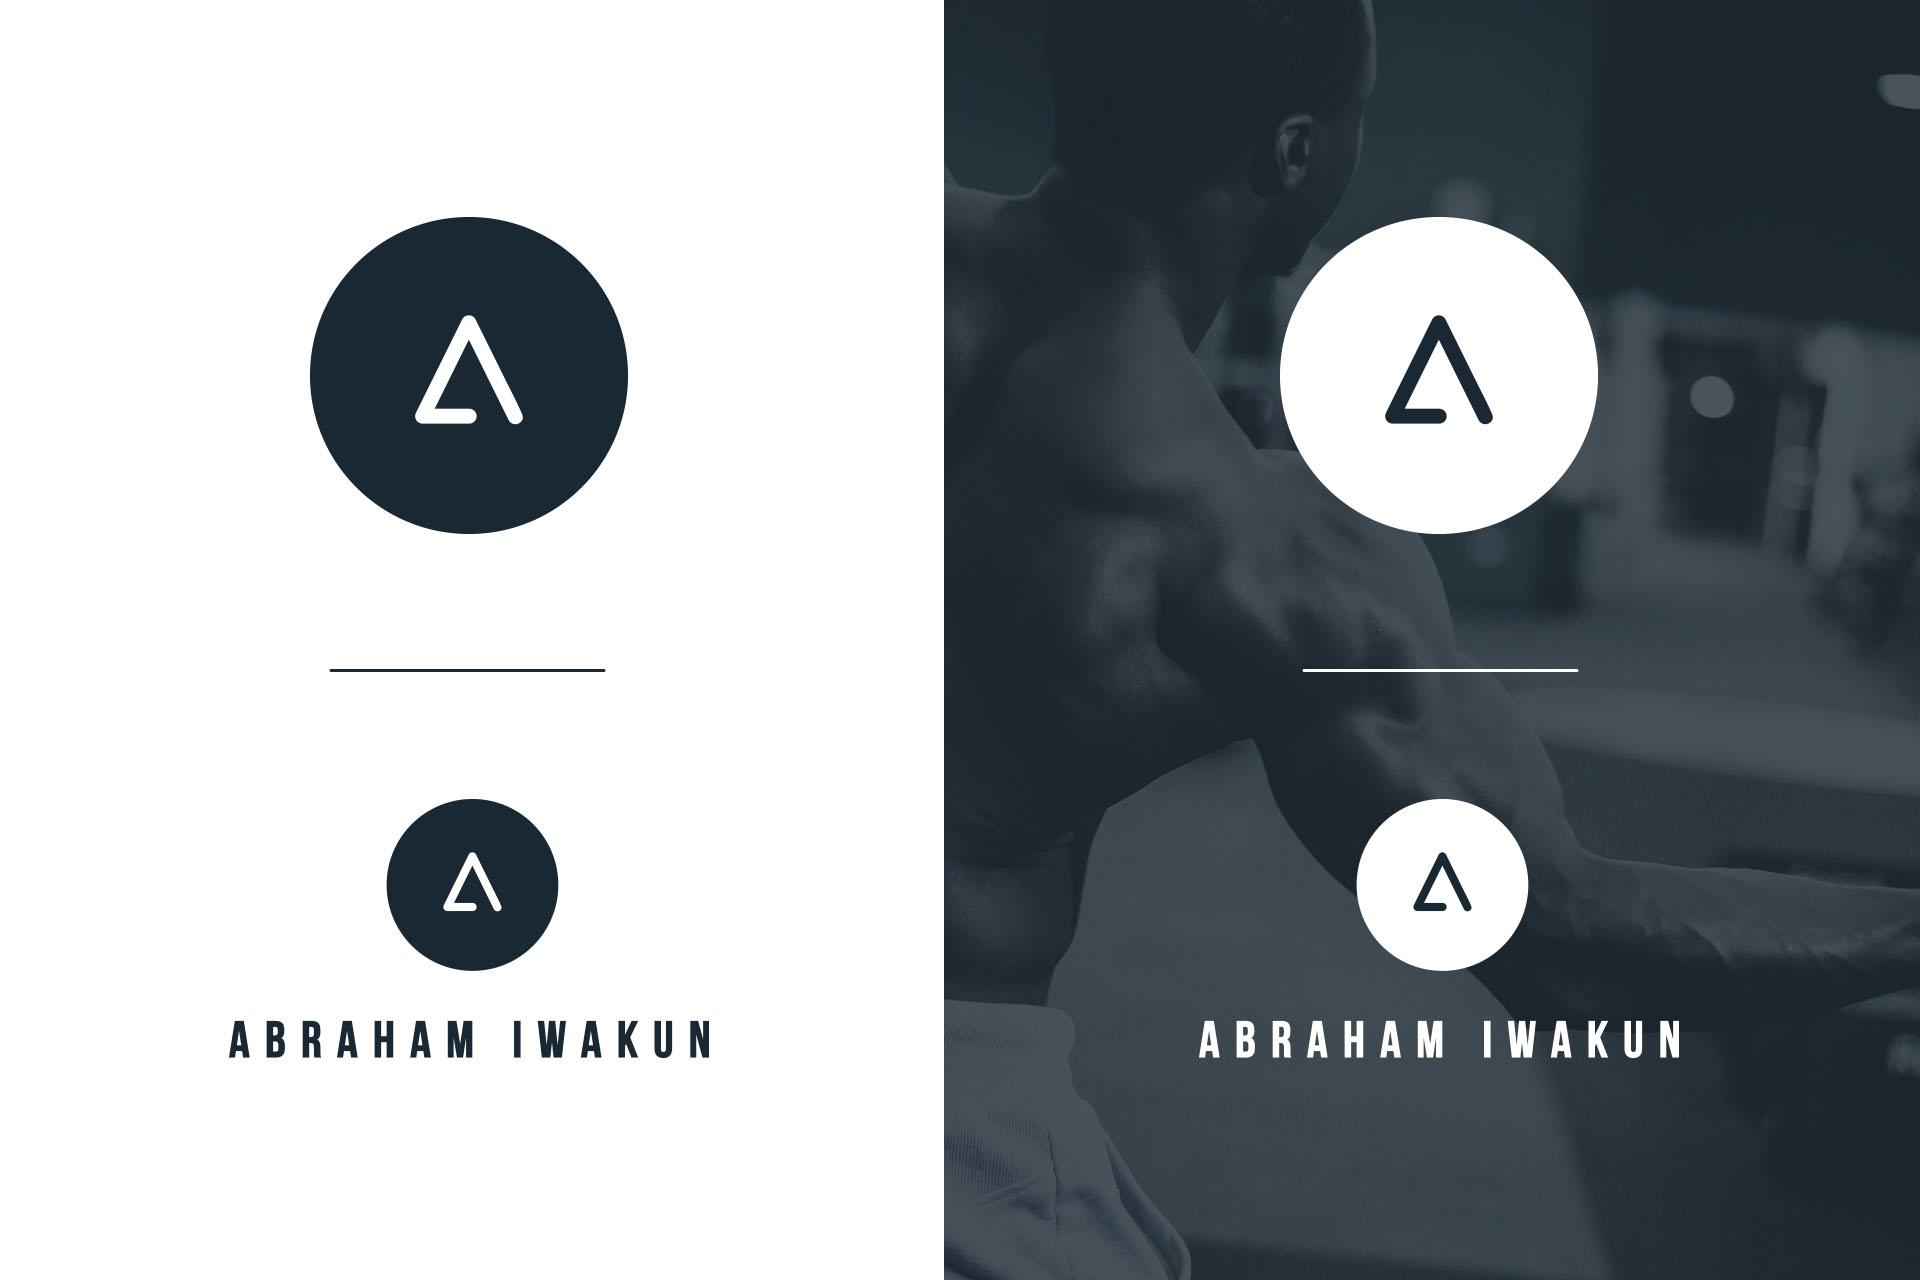 Abraham-Iwakun-project-by-Orfi-Media-2